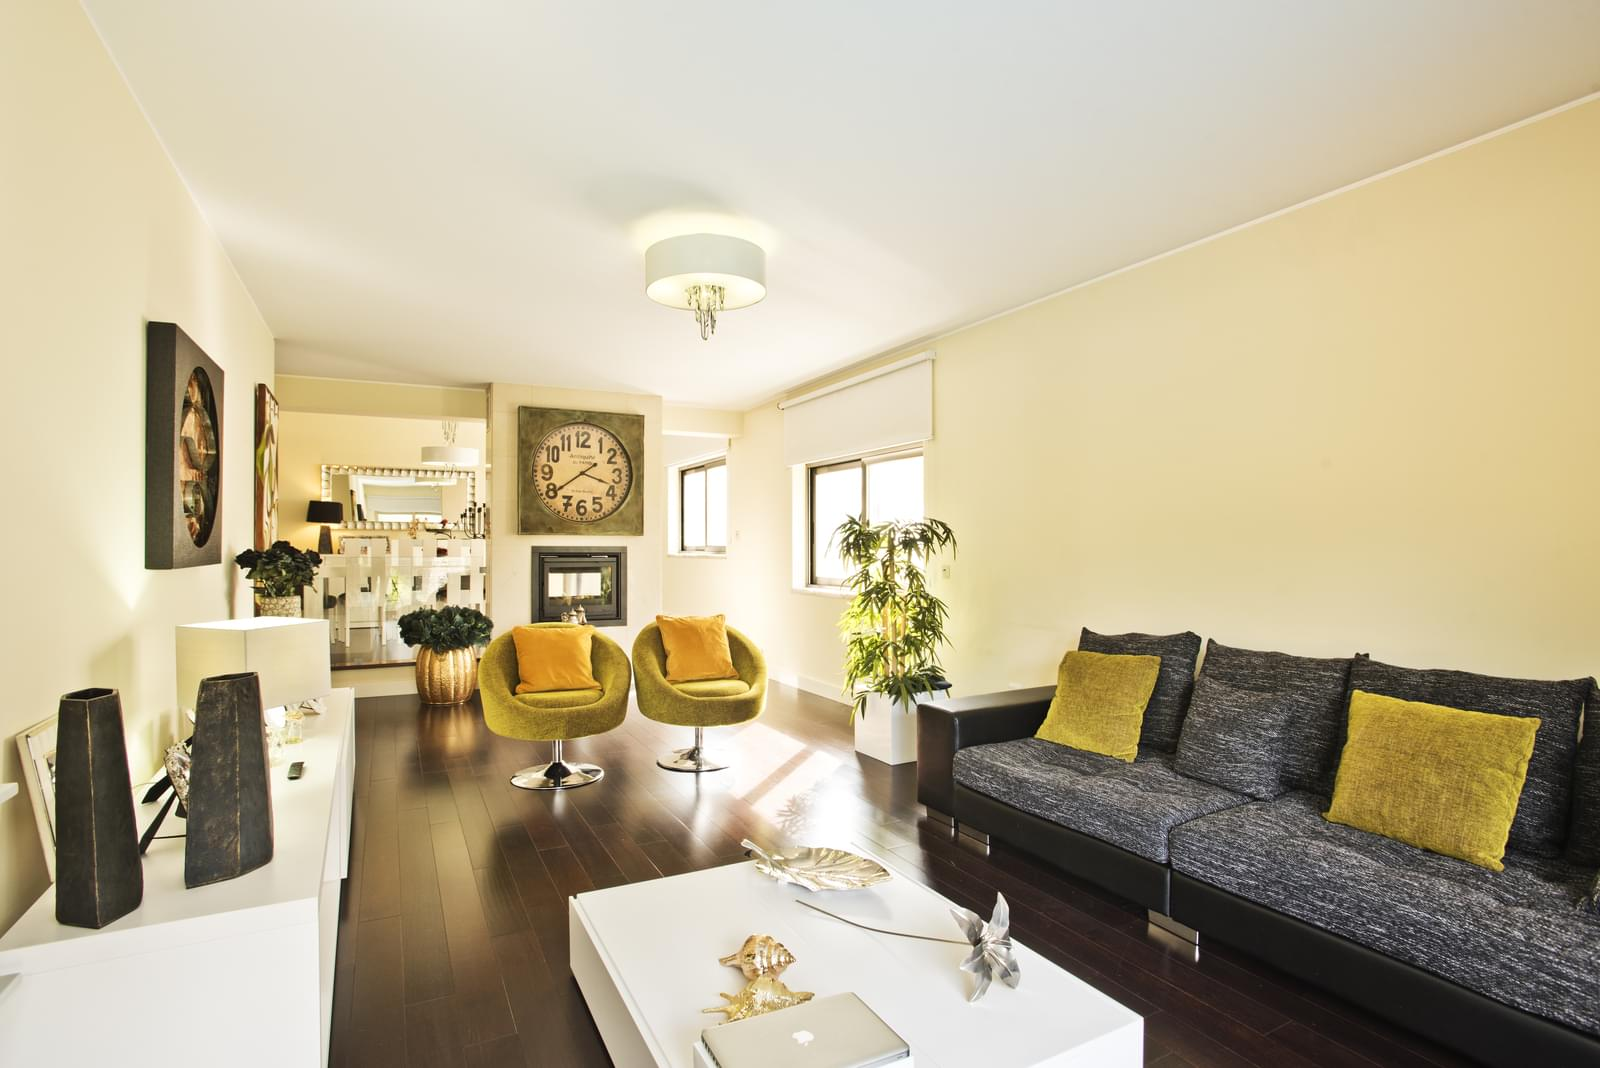 pf16902-apartamento-t3-cascais-4247e1c5-1a6b-48d5-8eaf-c39e3a0b41c6